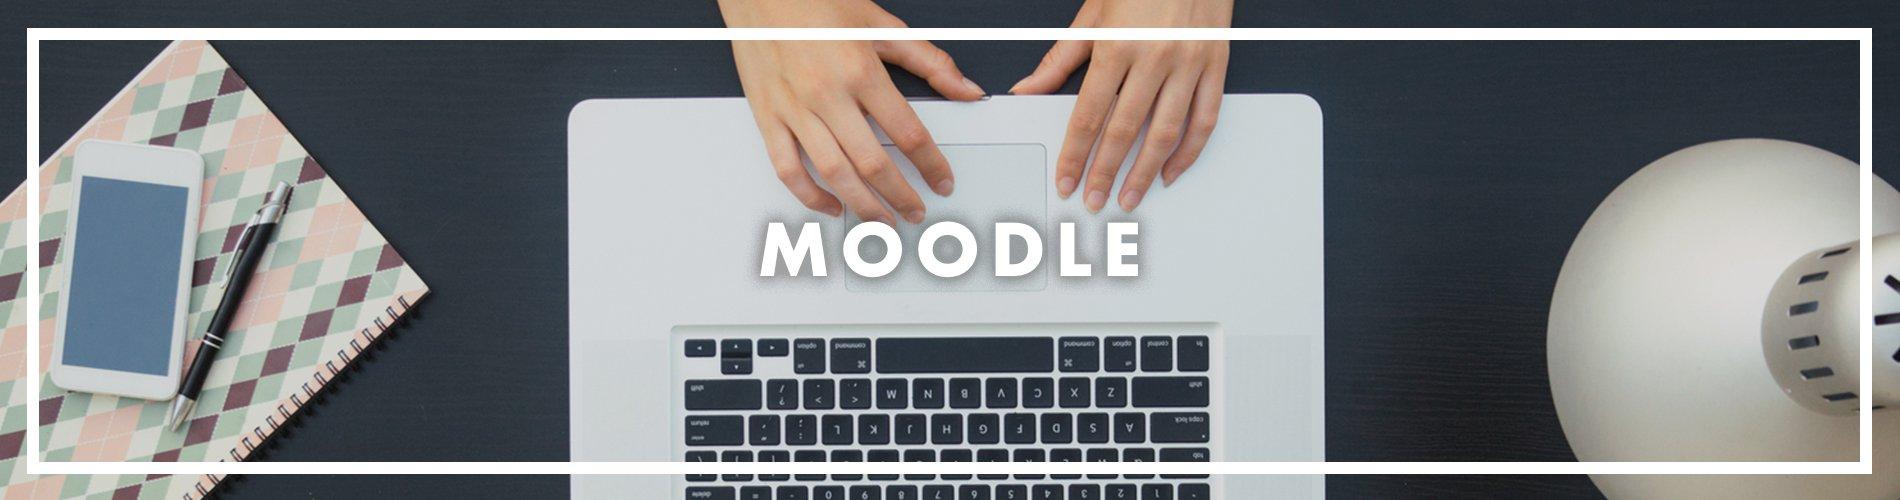 Moodle banner